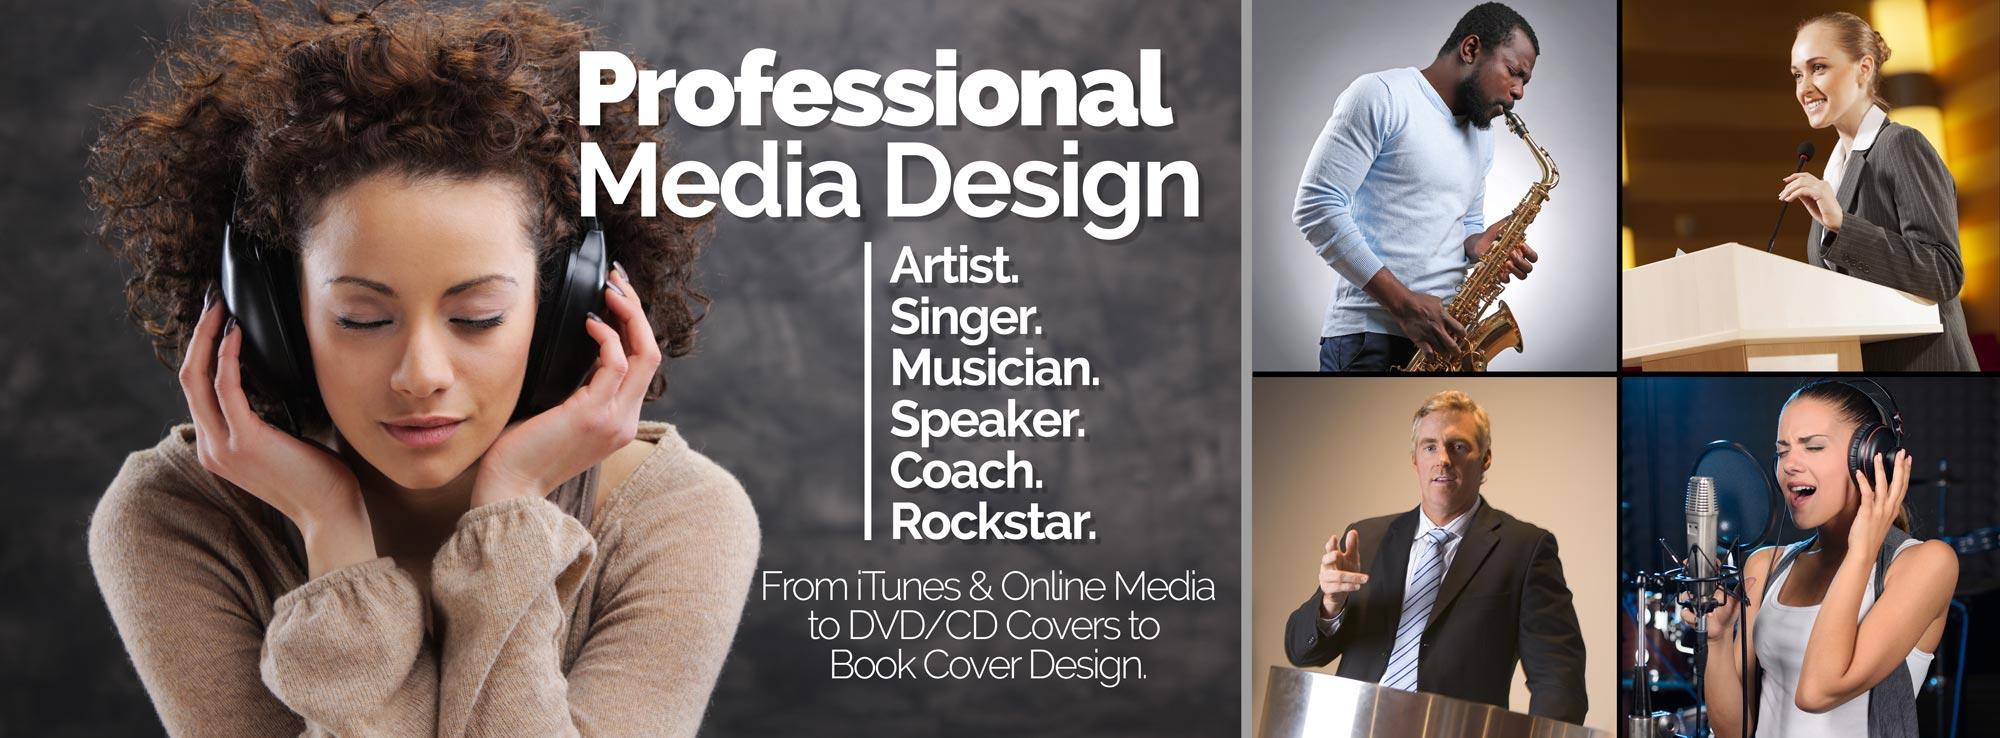 Professional Media Design - Splash Designworks - Ideas That Work